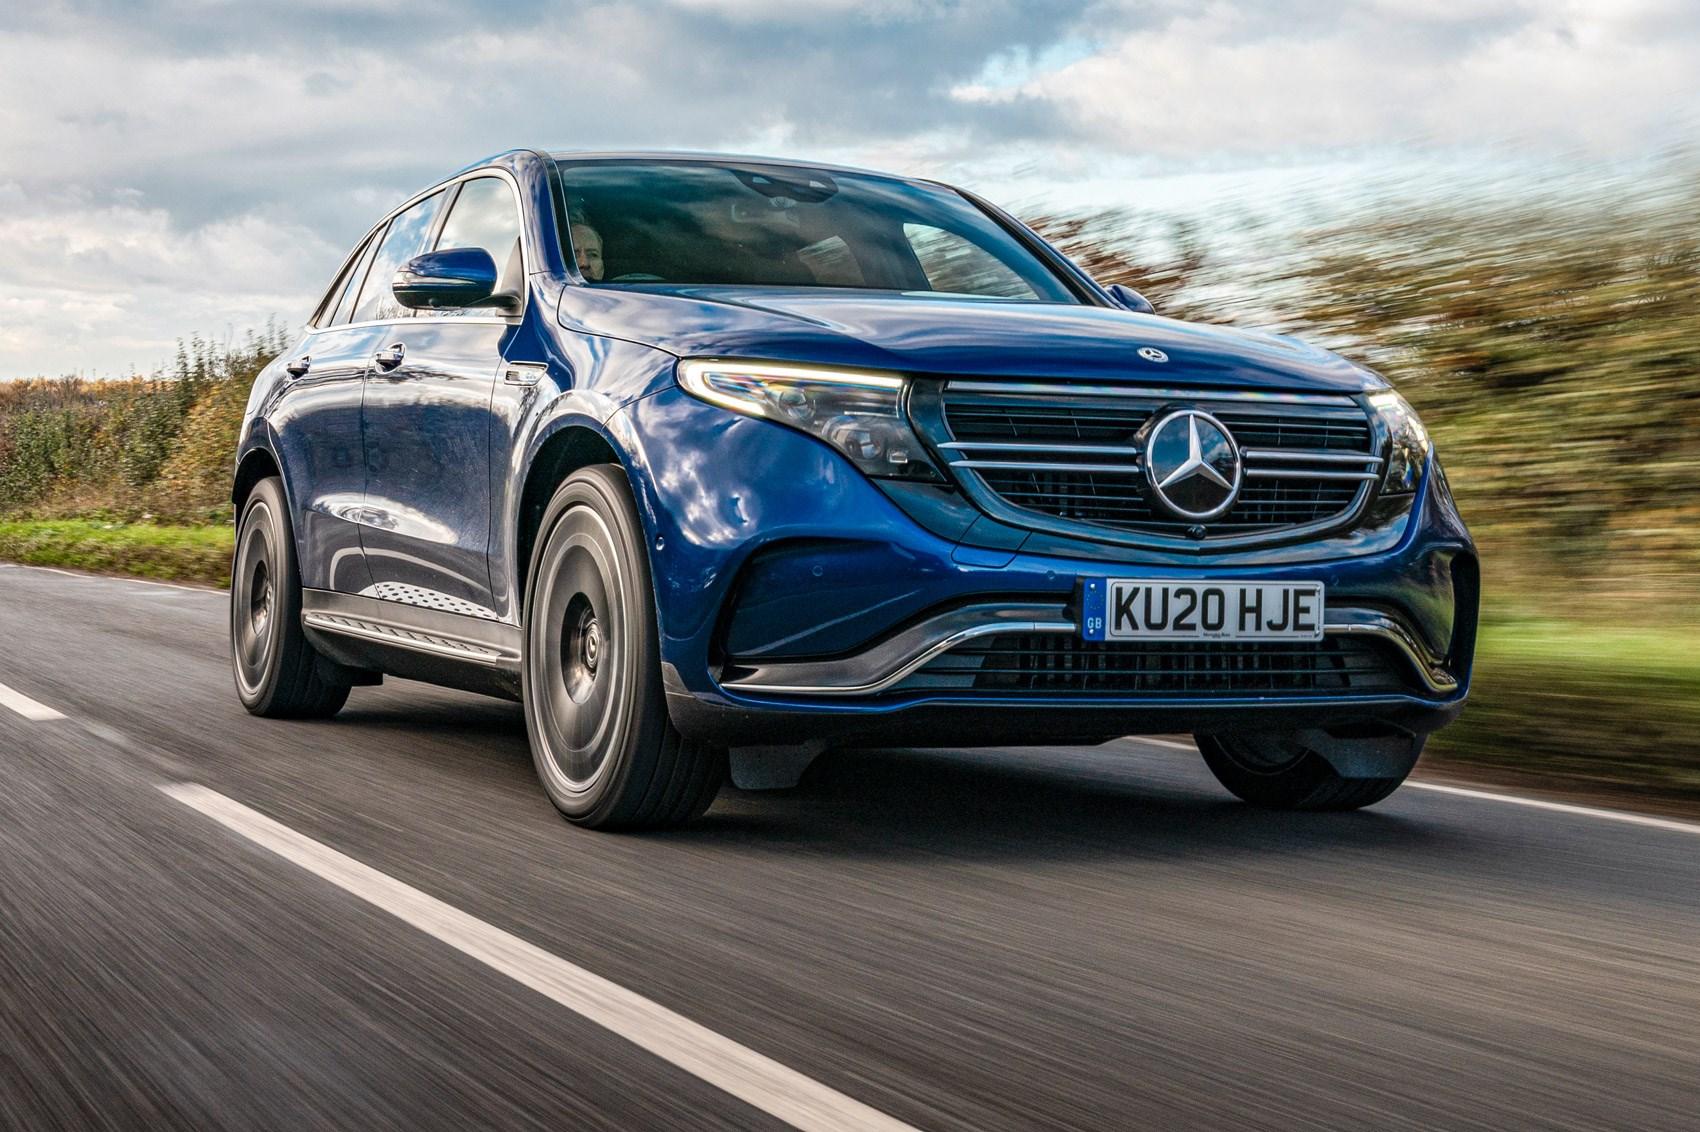 mercedes eqc electric car long-term test (2021) review